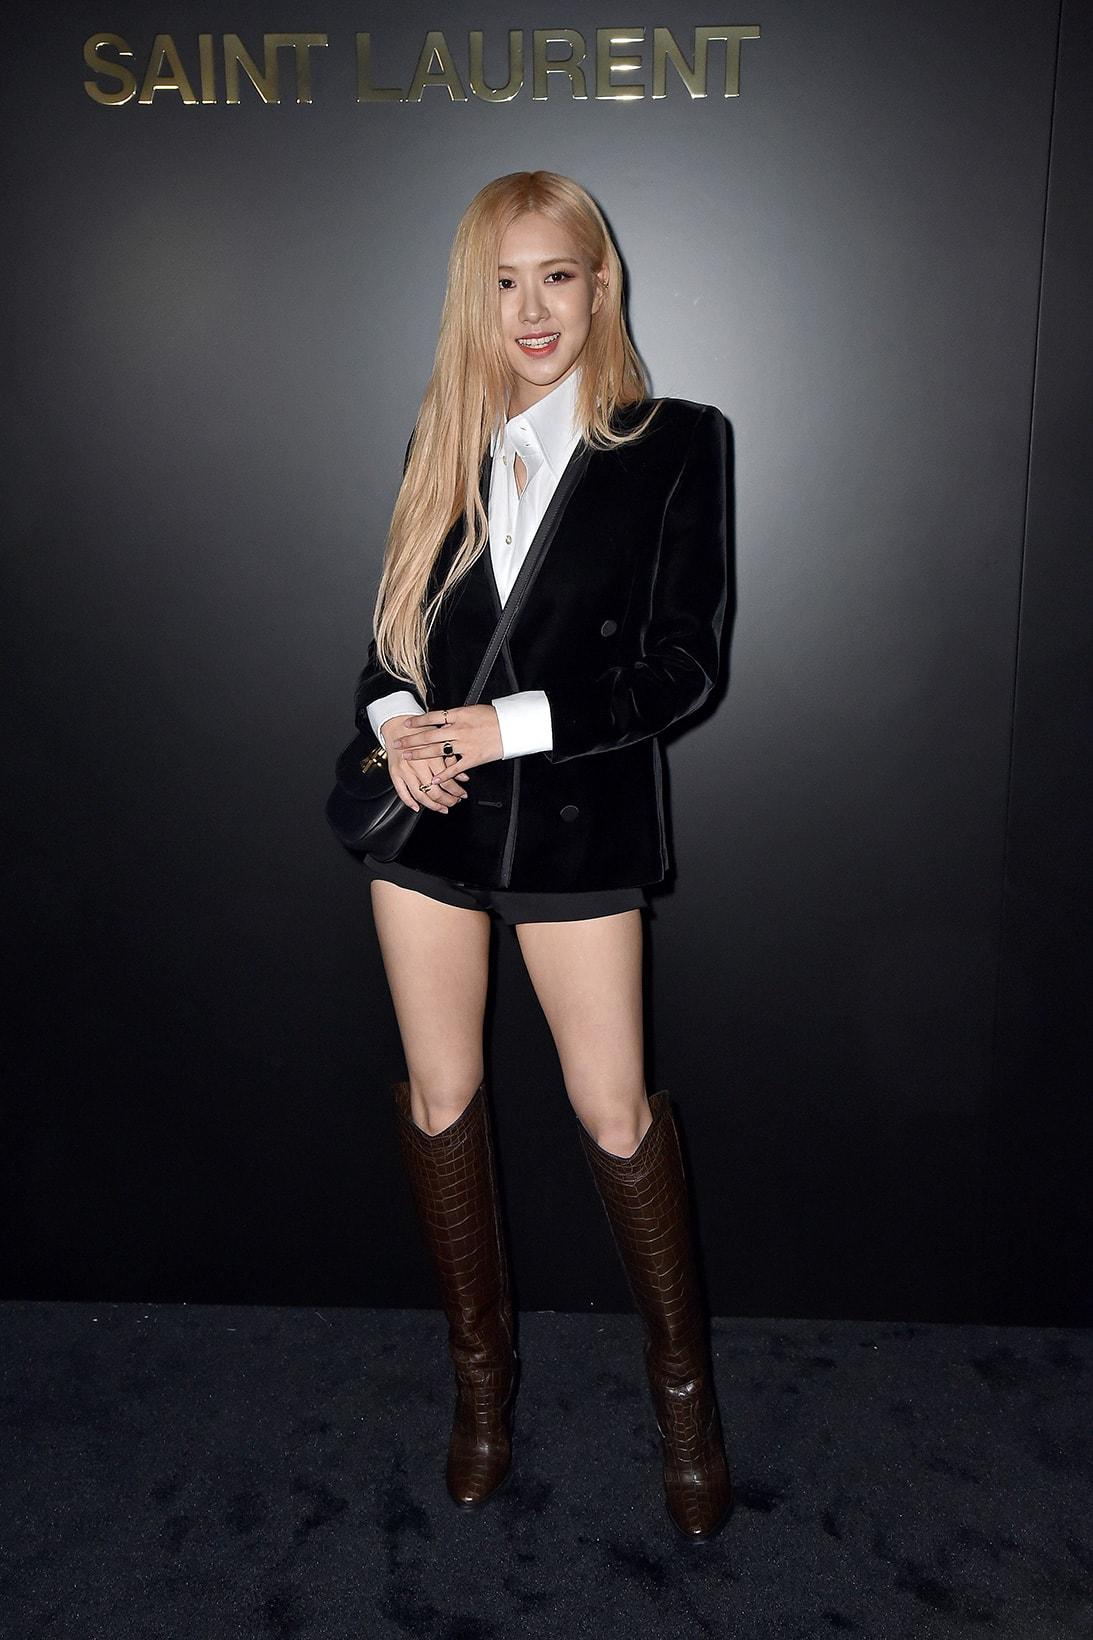 BLACKPINK Rose Jisoo Jennie Lisa Best Paris Fashion Week Looks K-Pop Girl Group Singers Artists South Korean Celebrity Style Dior Saint Laurent Chanel Celine